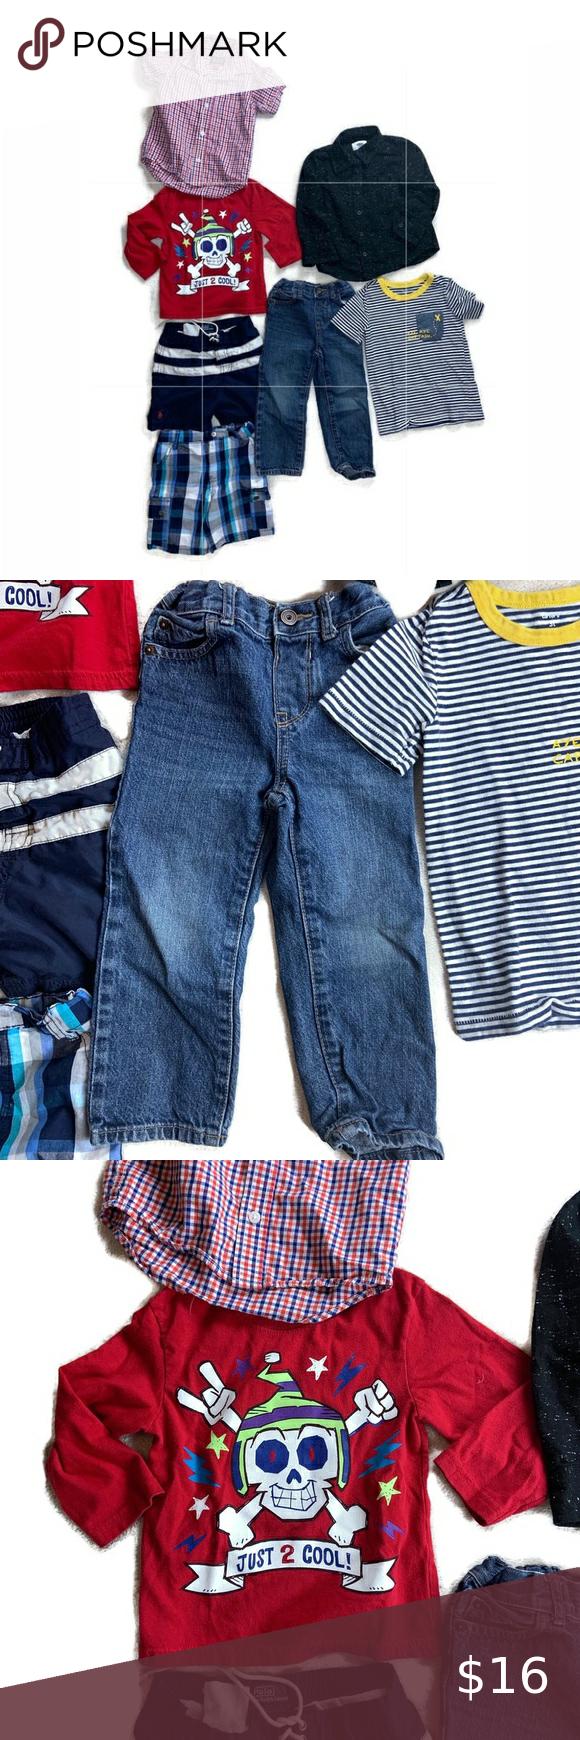 Toddler boys size 3T clothes mixed bundle 7 pcs Toddler boys mixed spring summboys